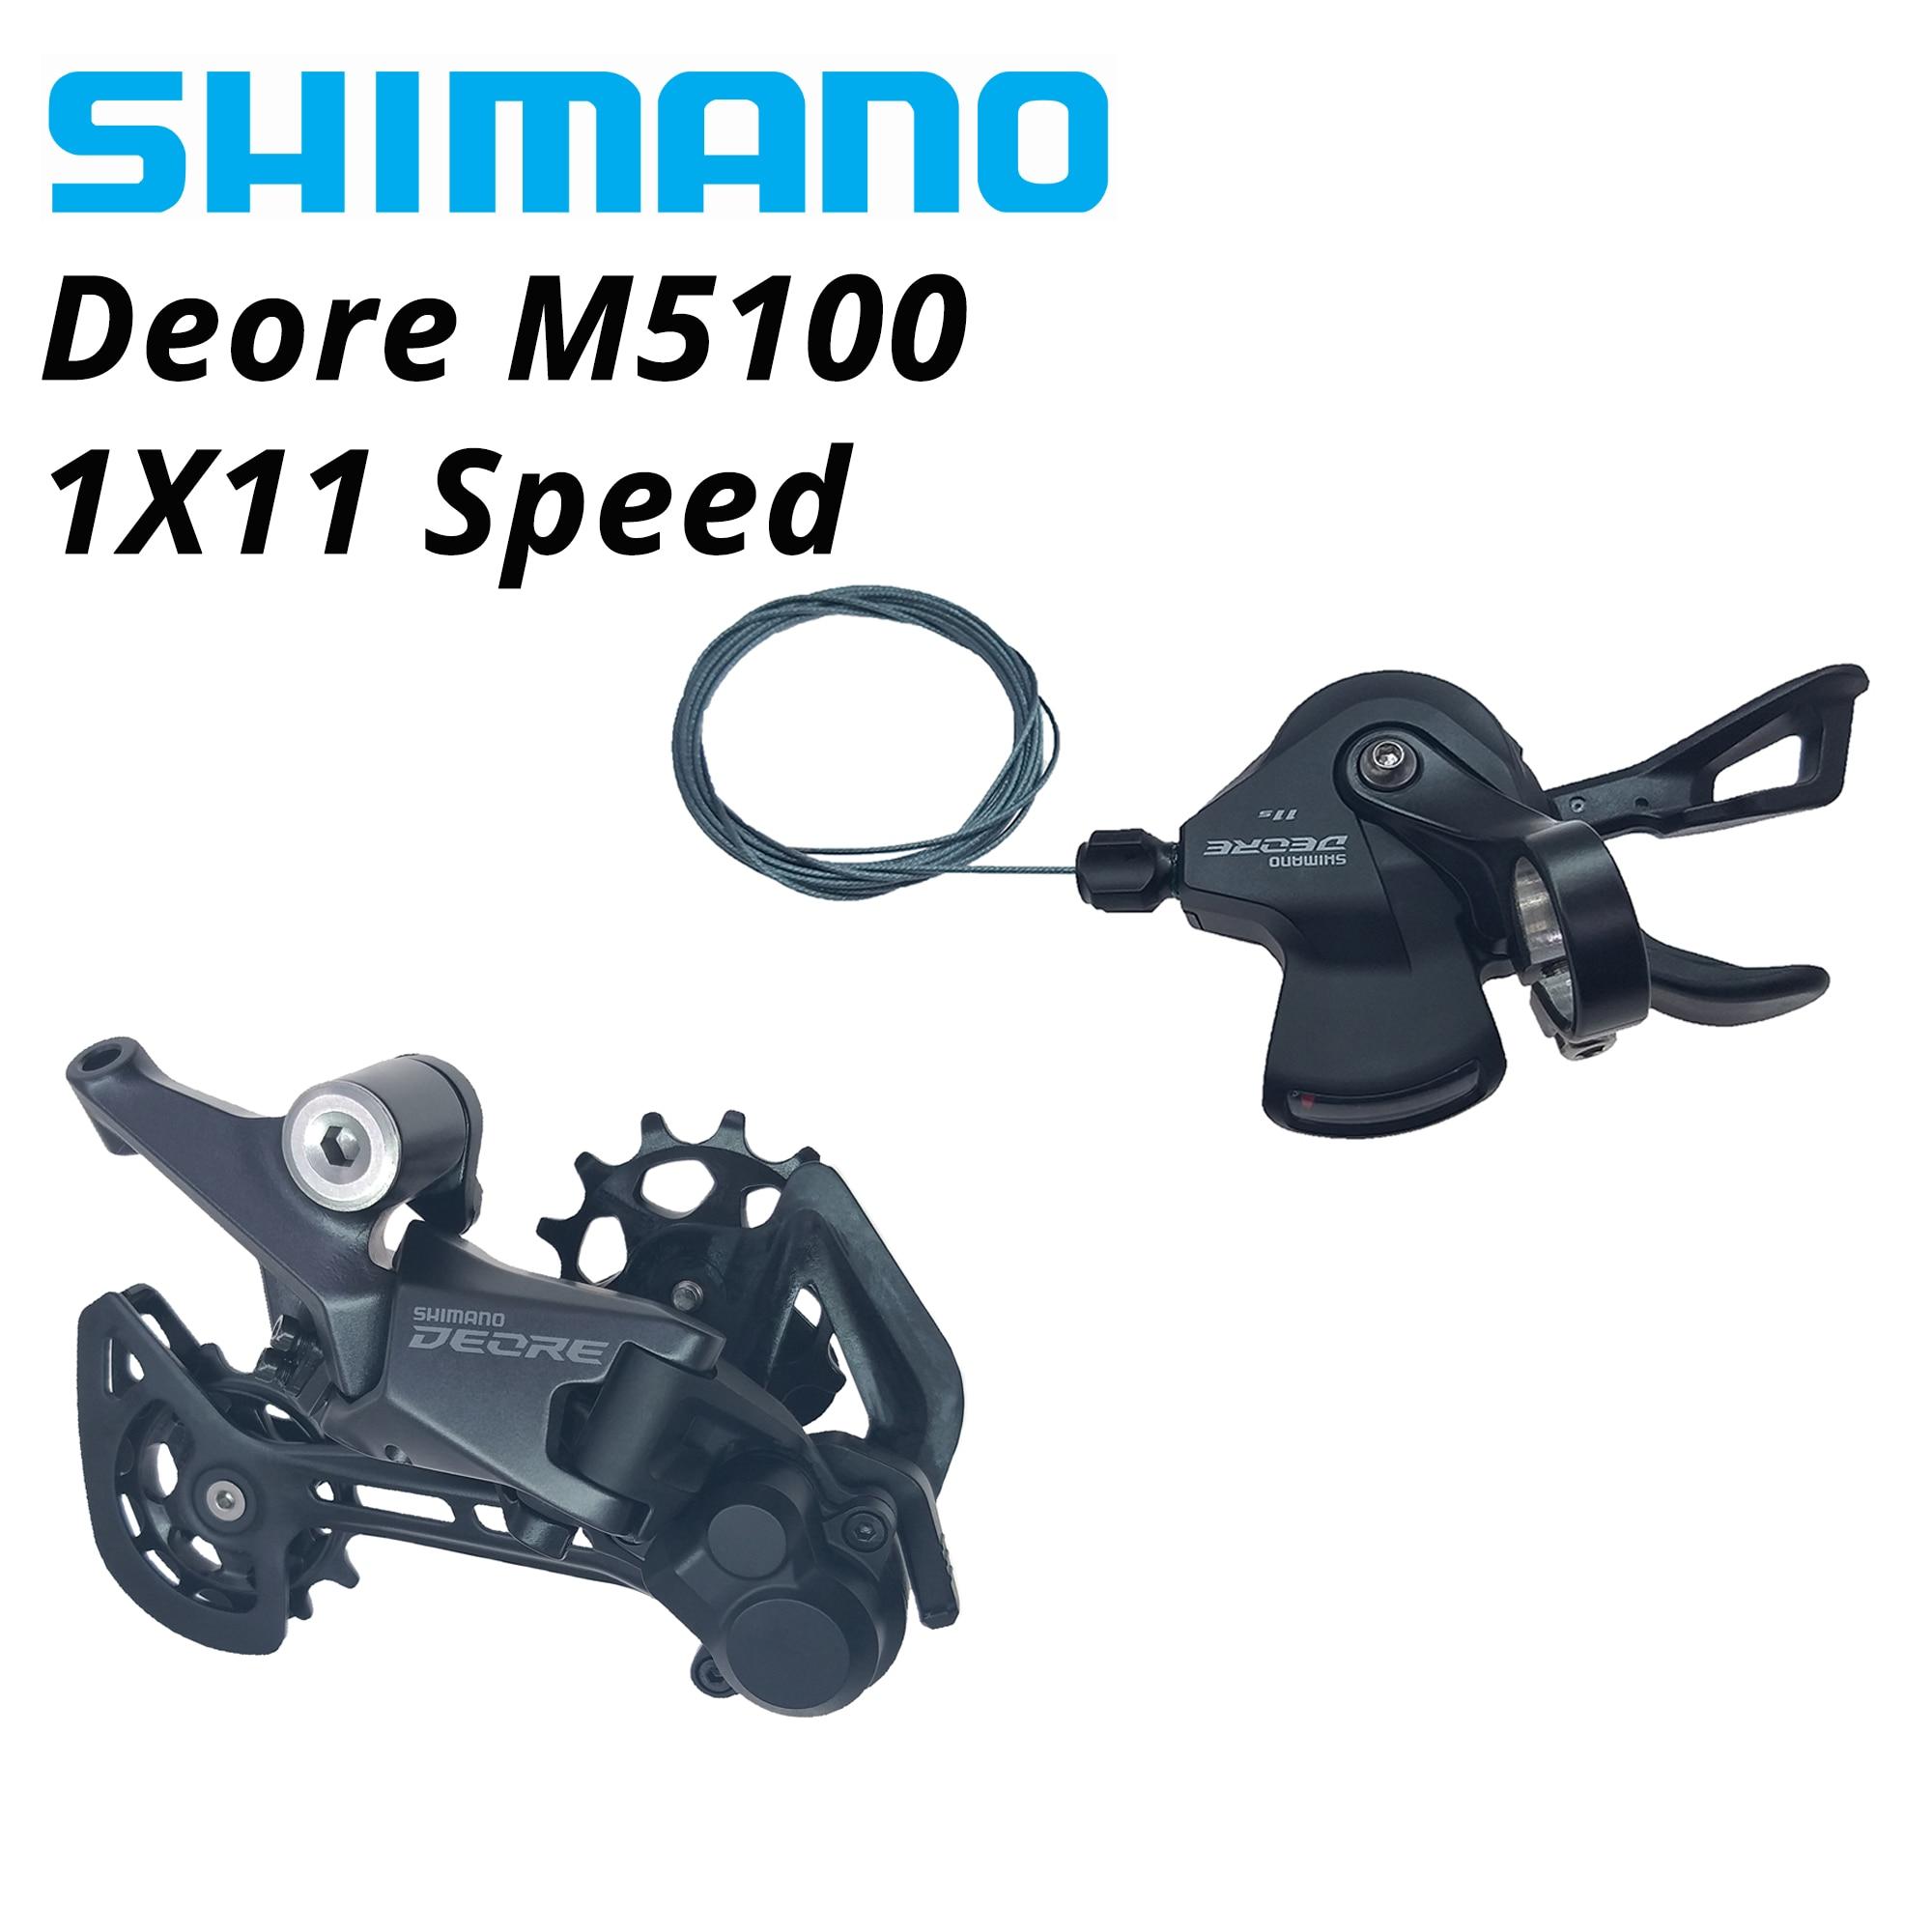 SHIMANO-SL-M5100 DEORE M5100 11s 11V 51T para bicicleta, RD-M5100